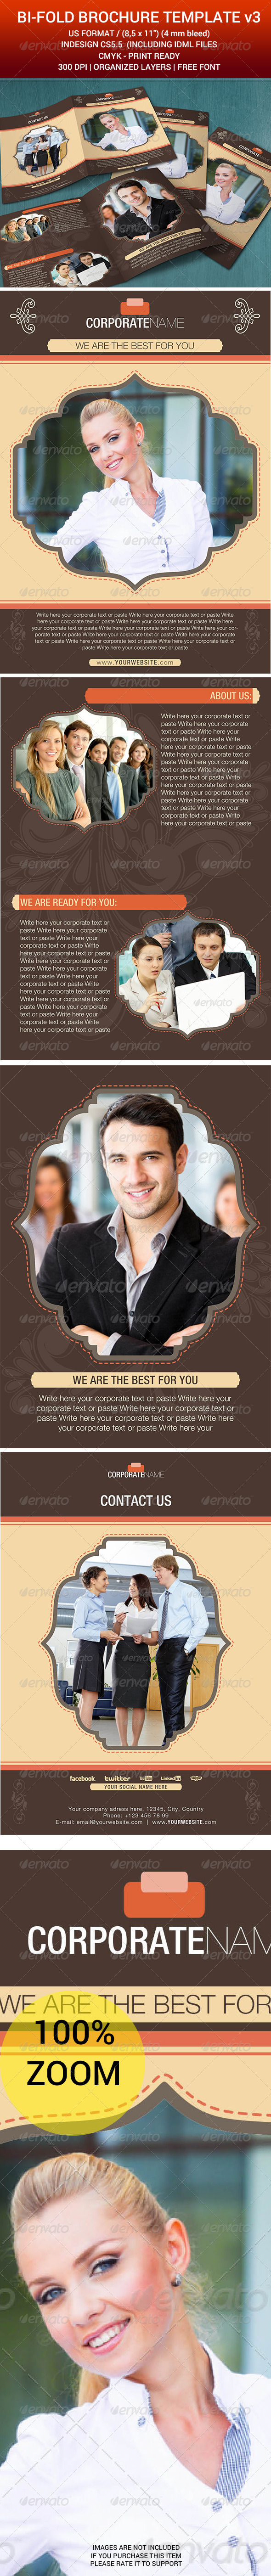 Bi-Fold Brochure Indesign Template v2 - Corporate Business Cards